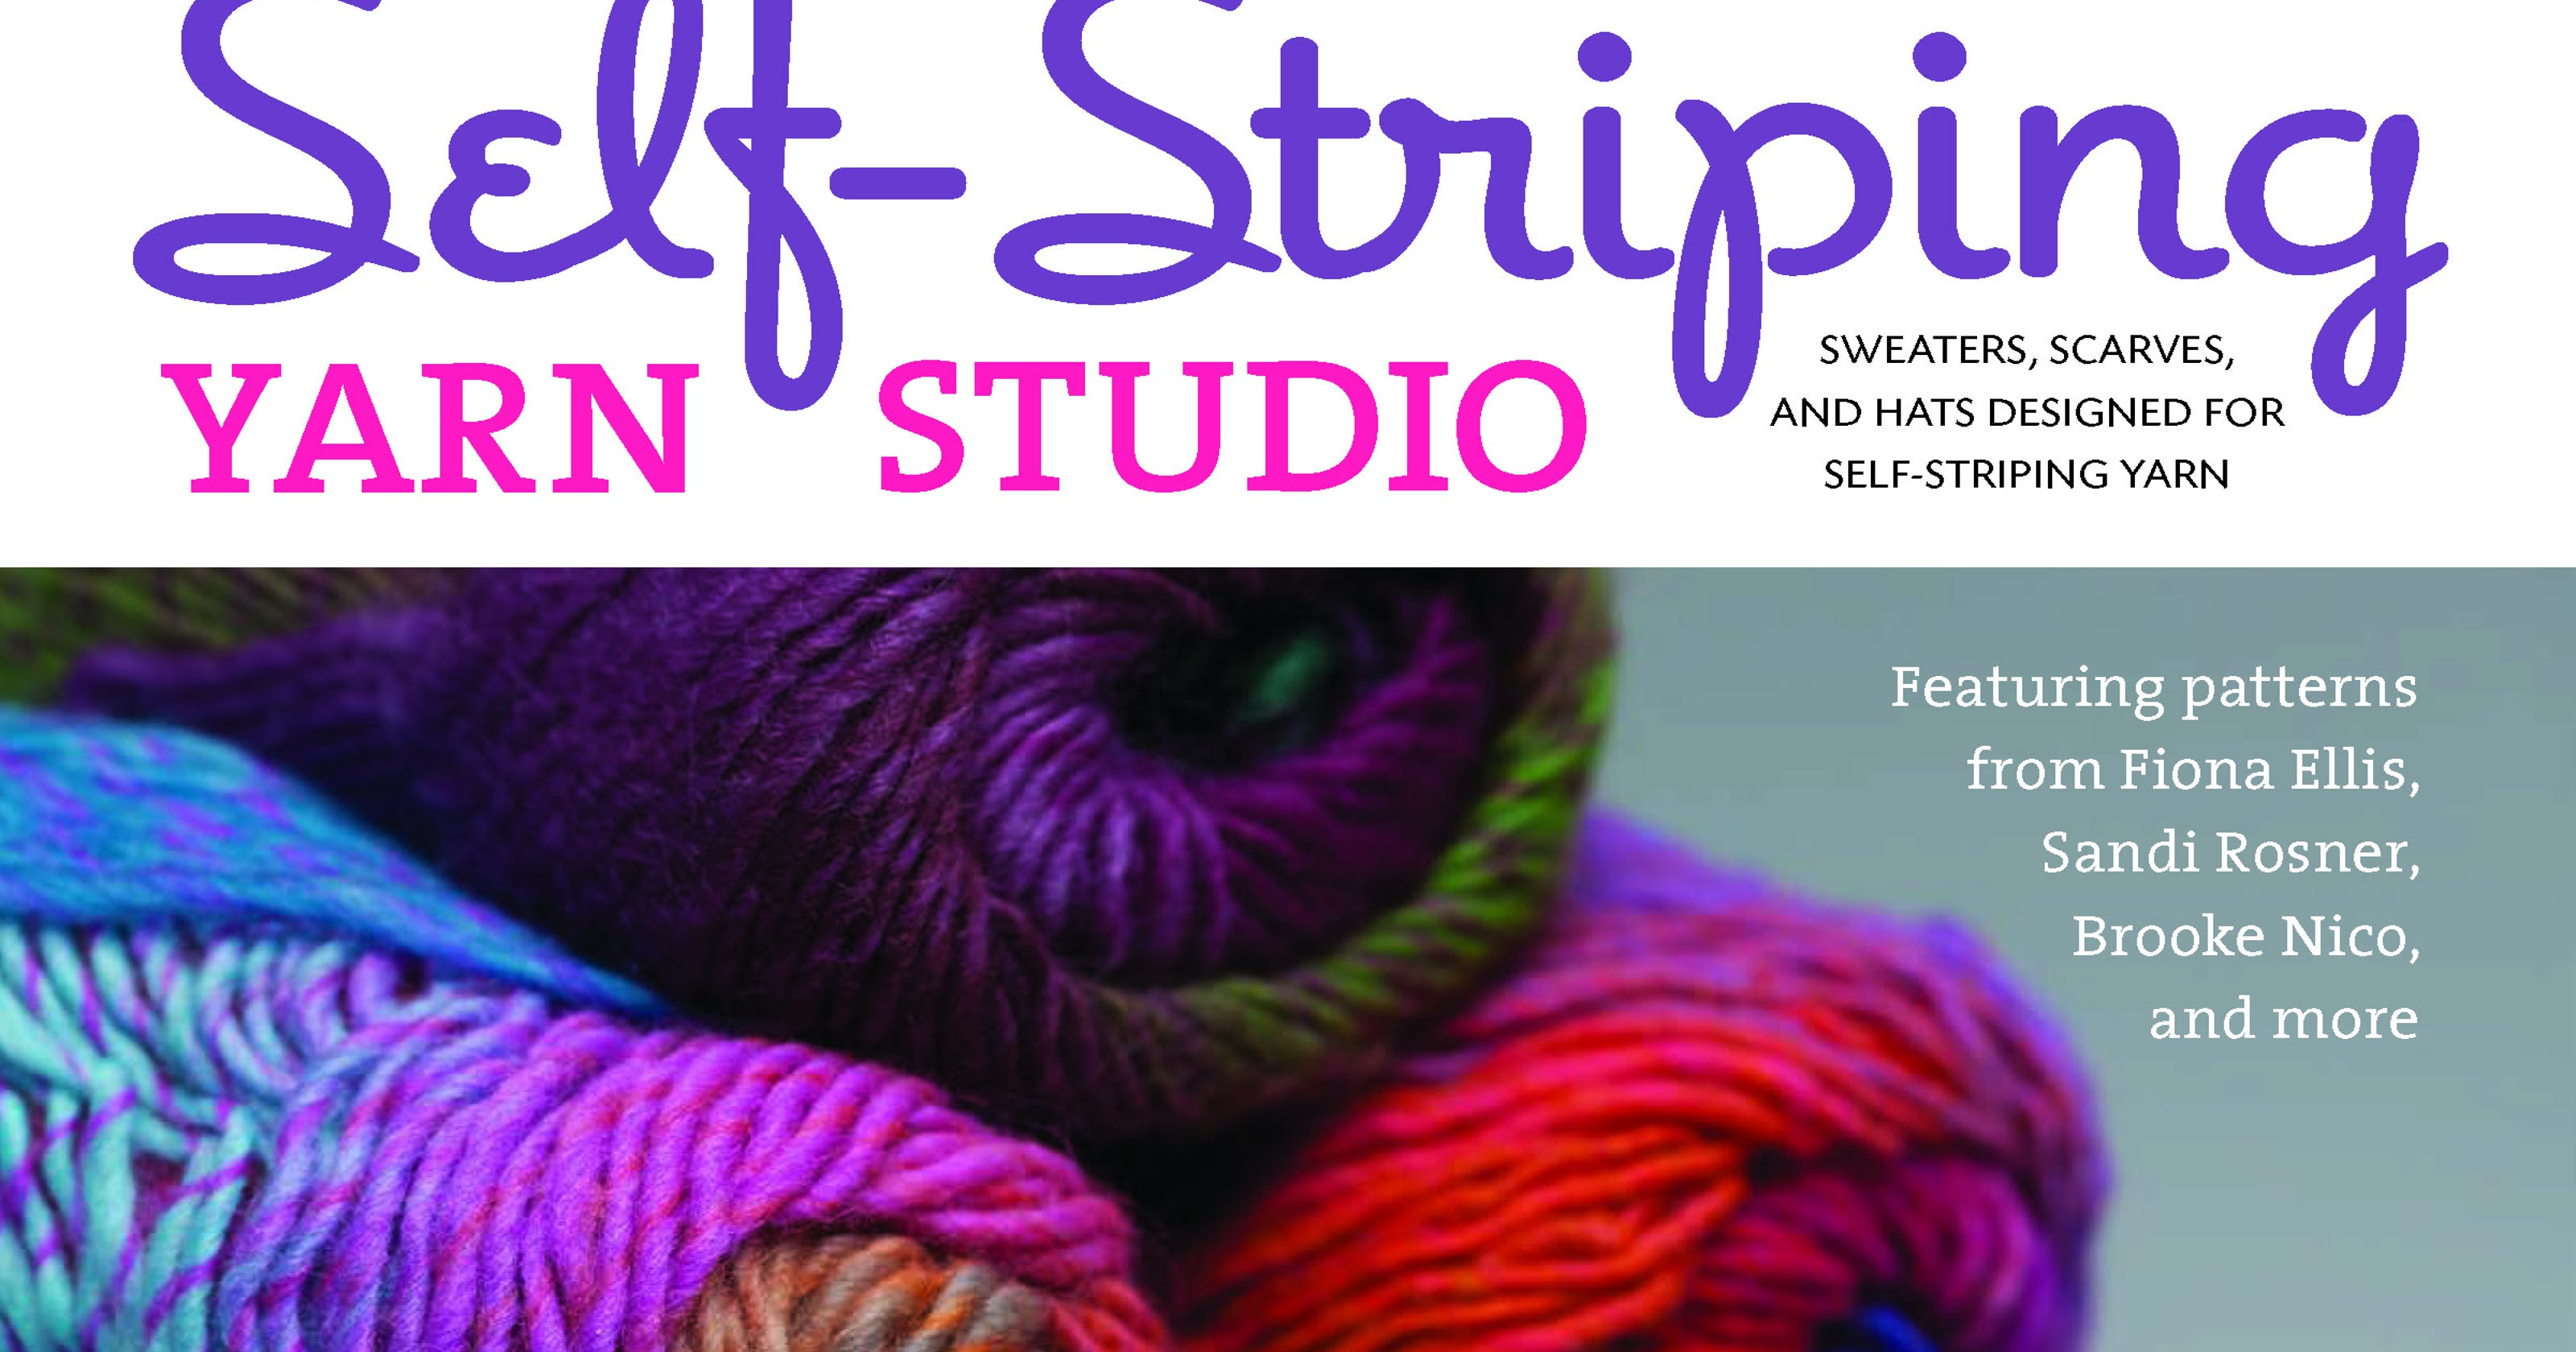 Self-striping yarn studio\